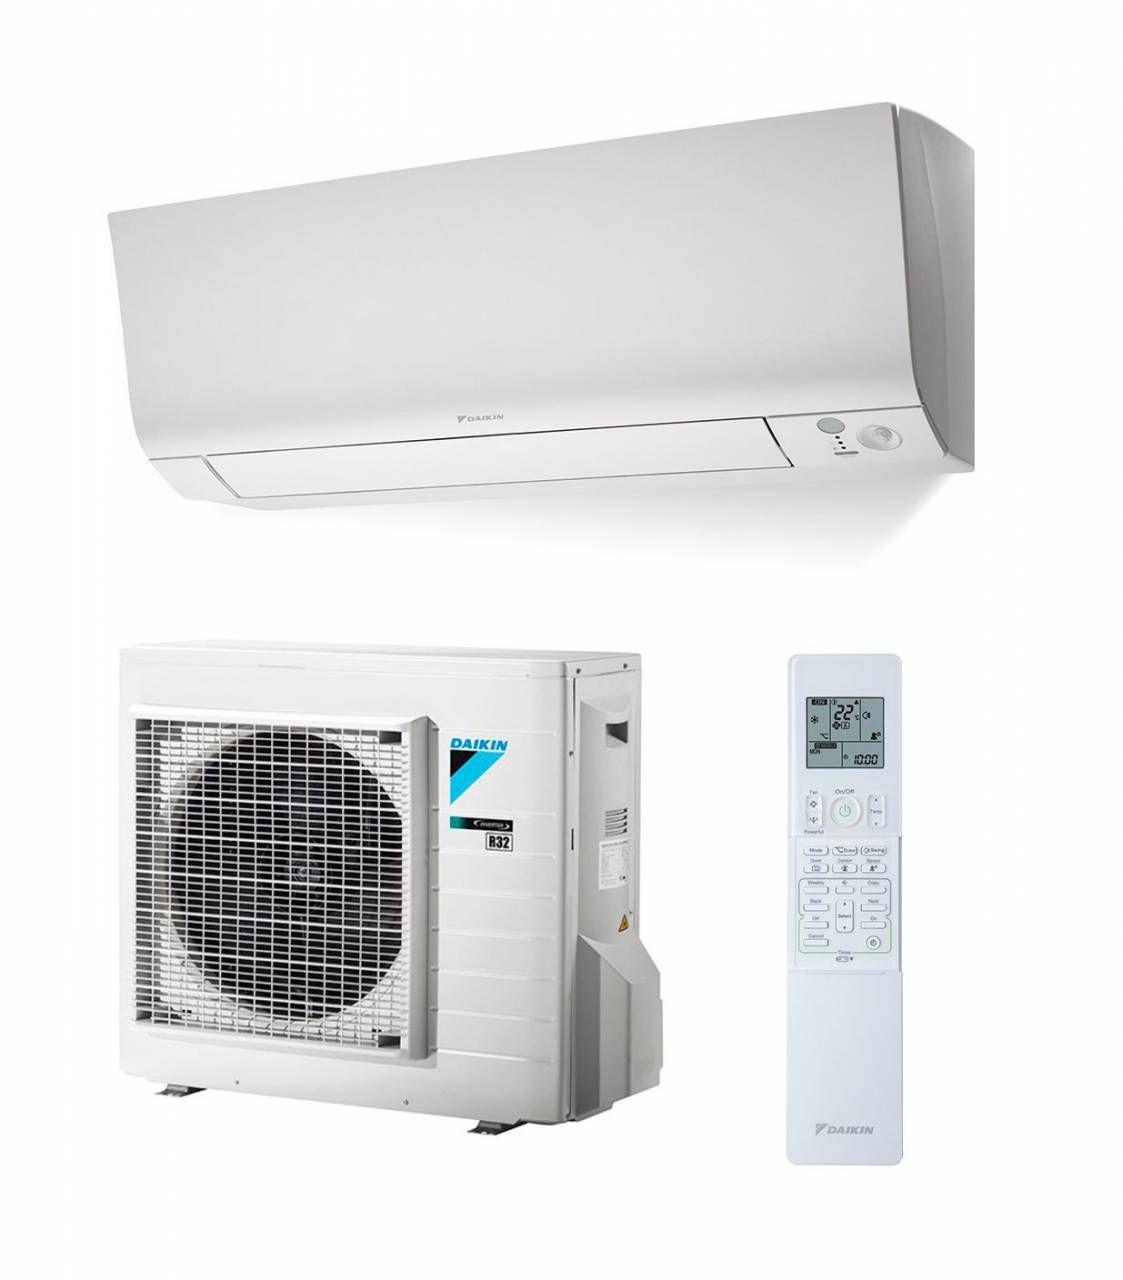 Aer Conditionat DAIKIN FTXM20N+RXM20N - 7000 BTU